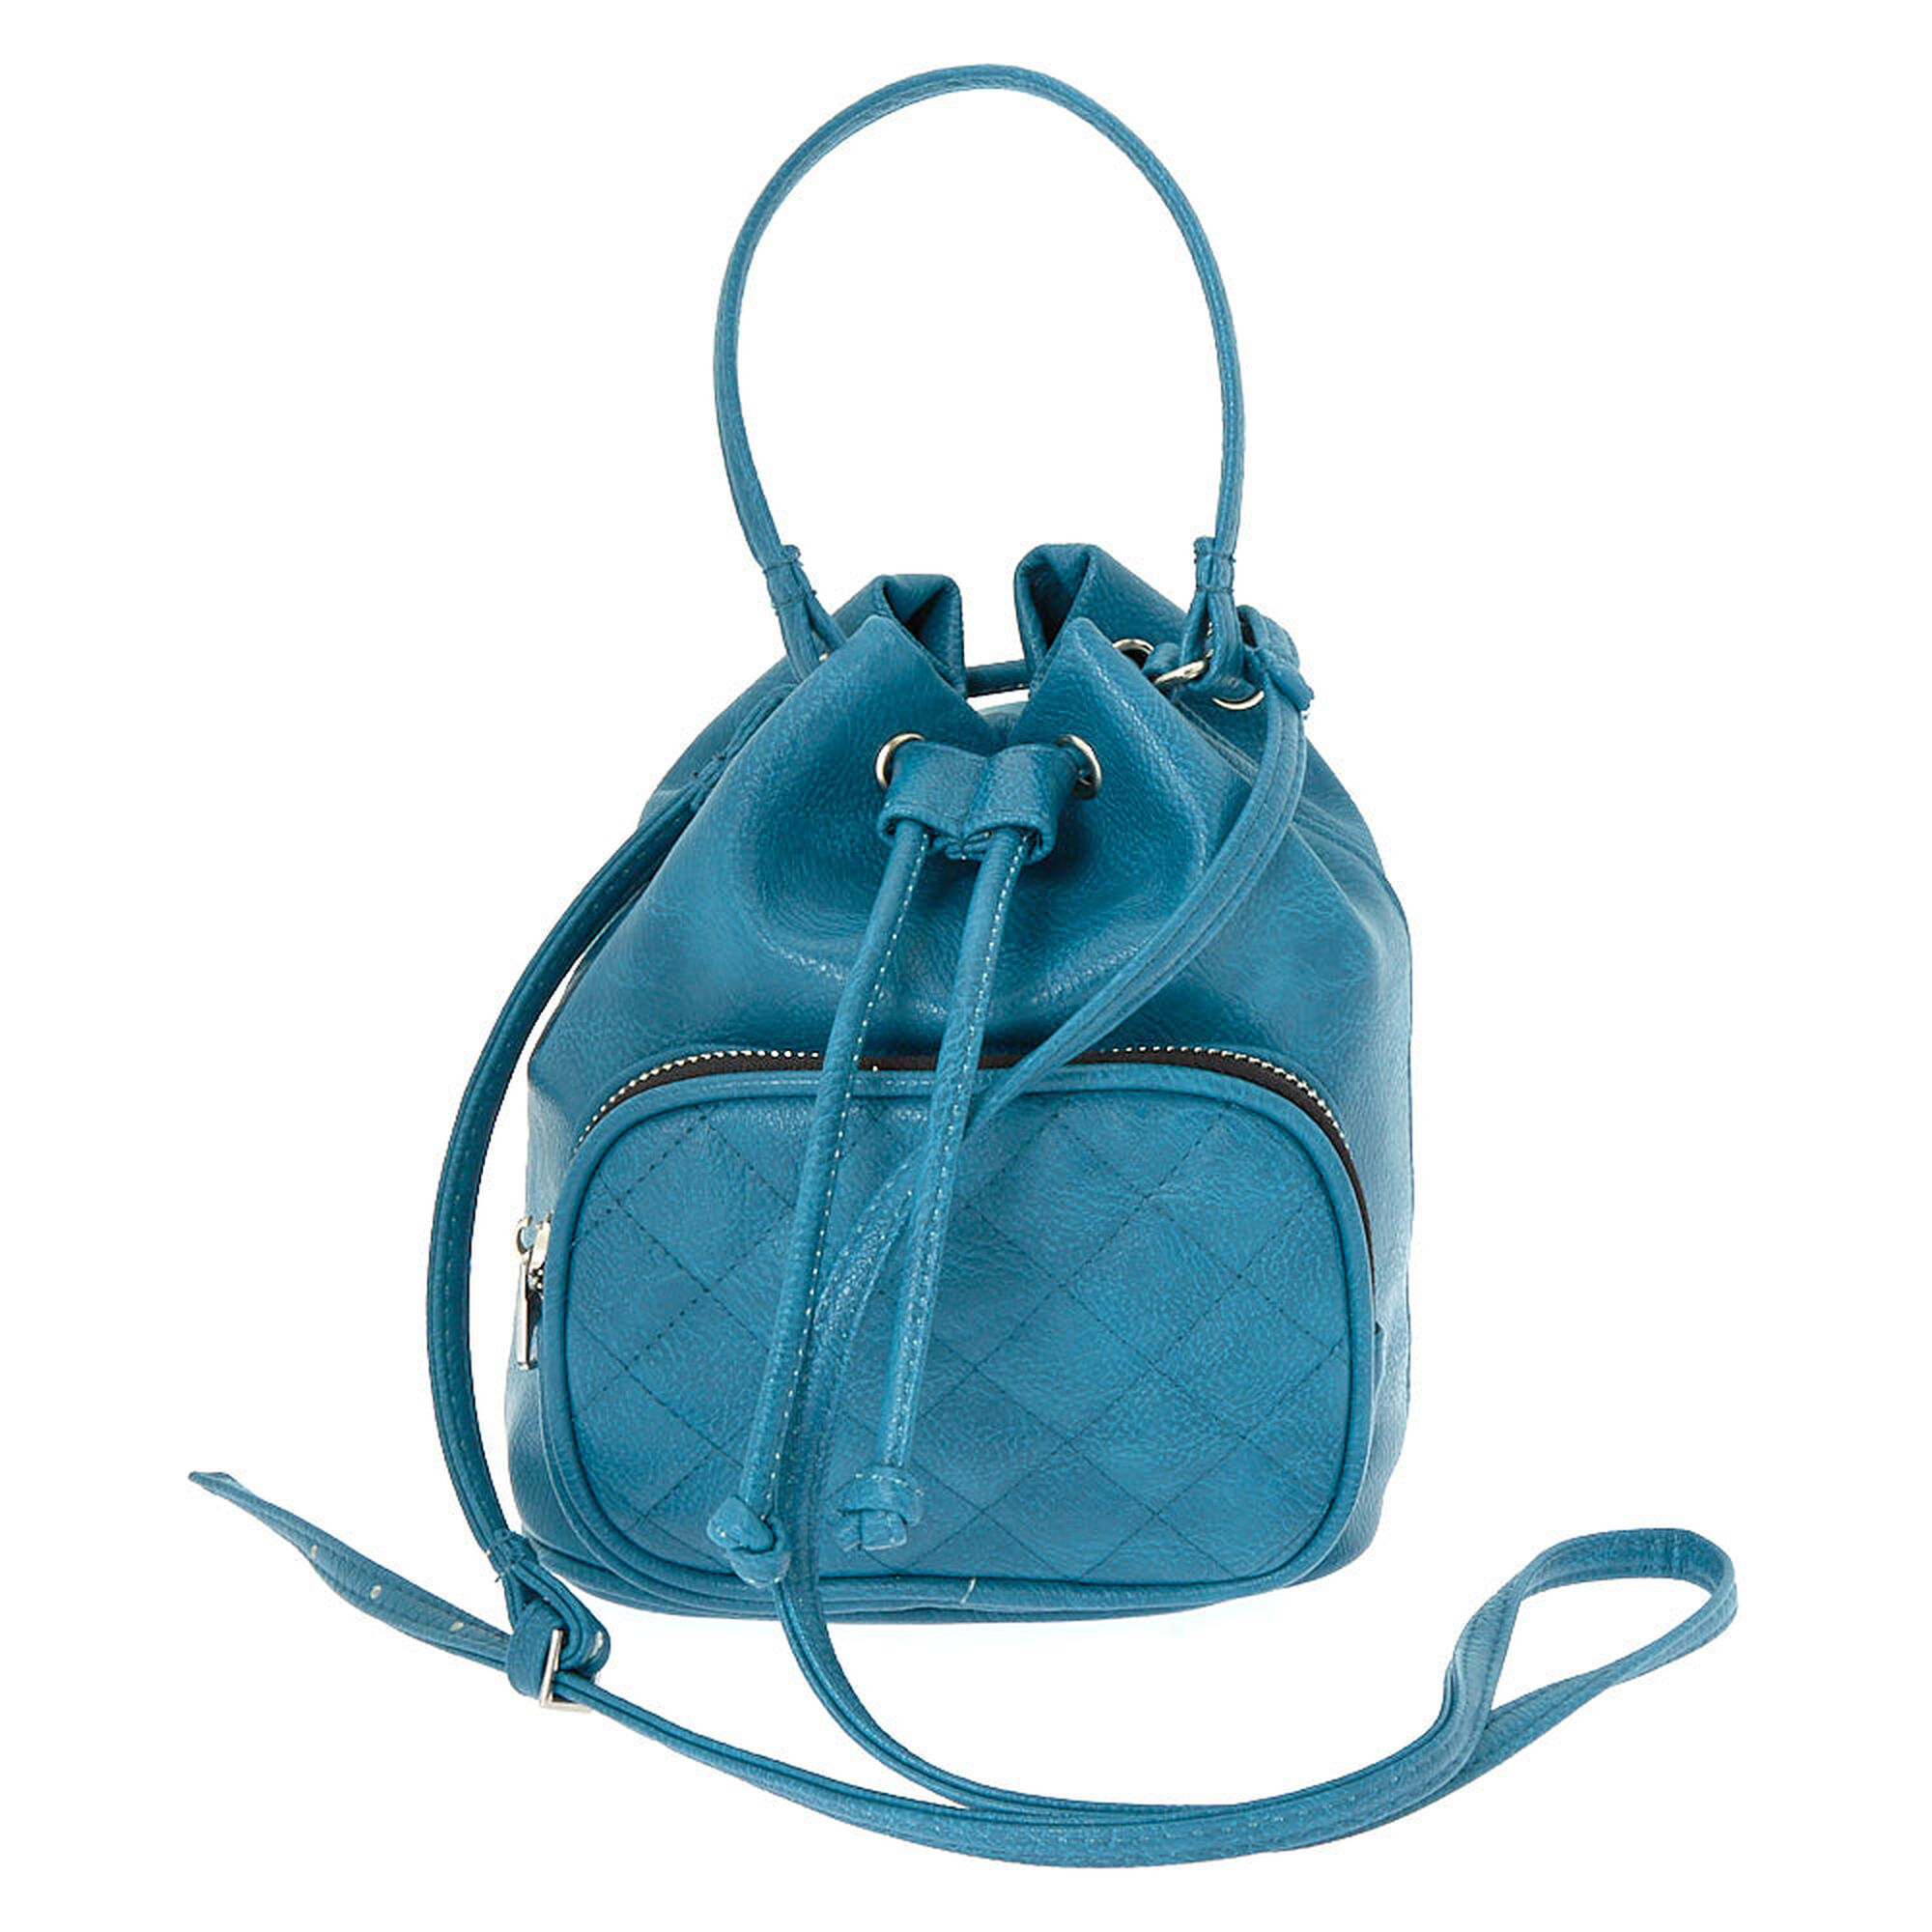 Faux Leather Mini Bucket Crossbody Bag Teal